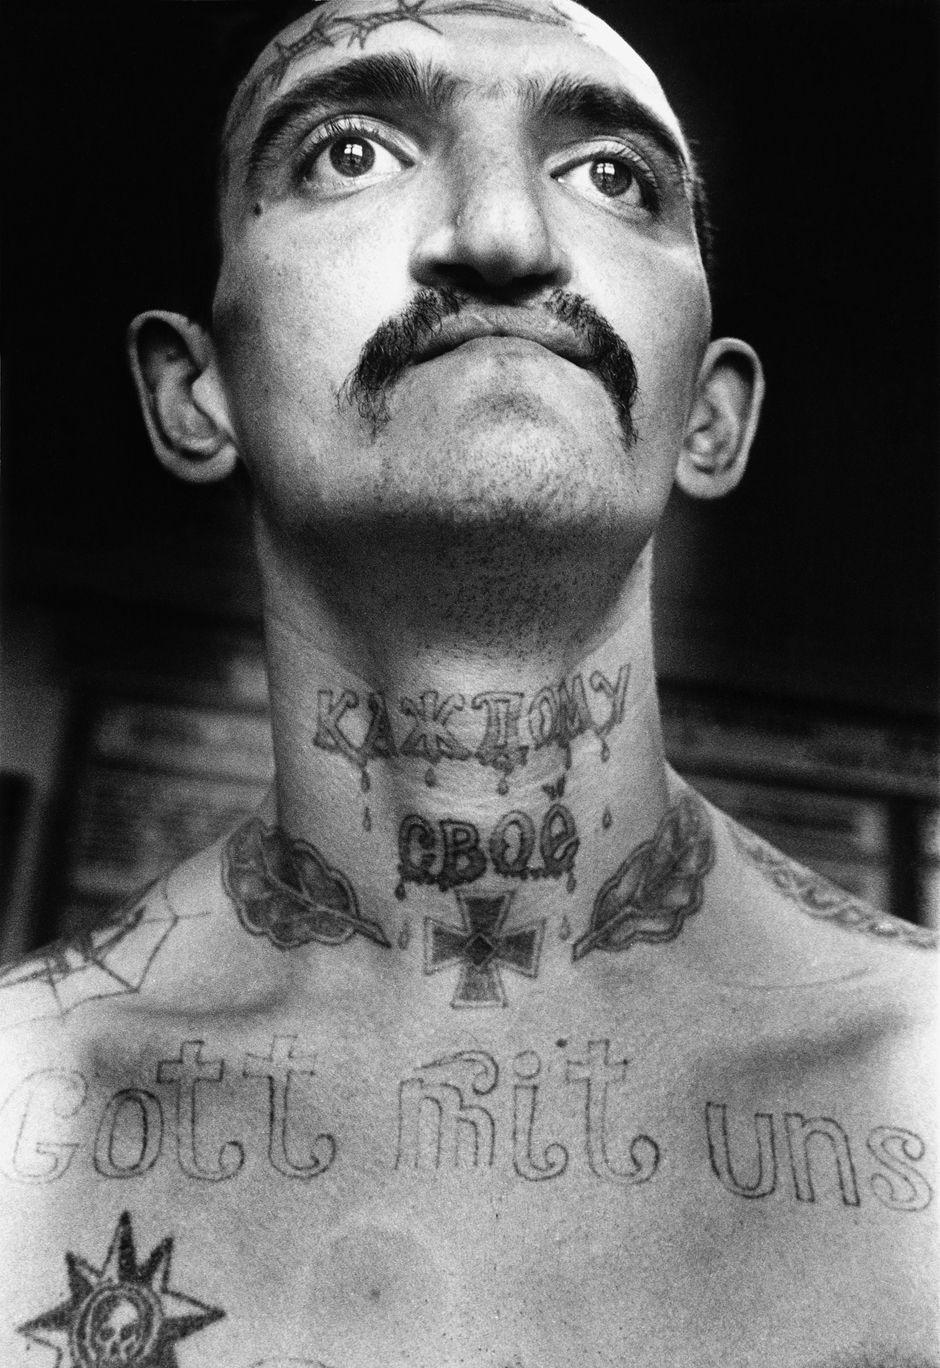 http://www.laboiteverte.fr/wp-content/uploads/2011/02/tatouage-encyclopedie-criminel-russe-prison-02.jpg